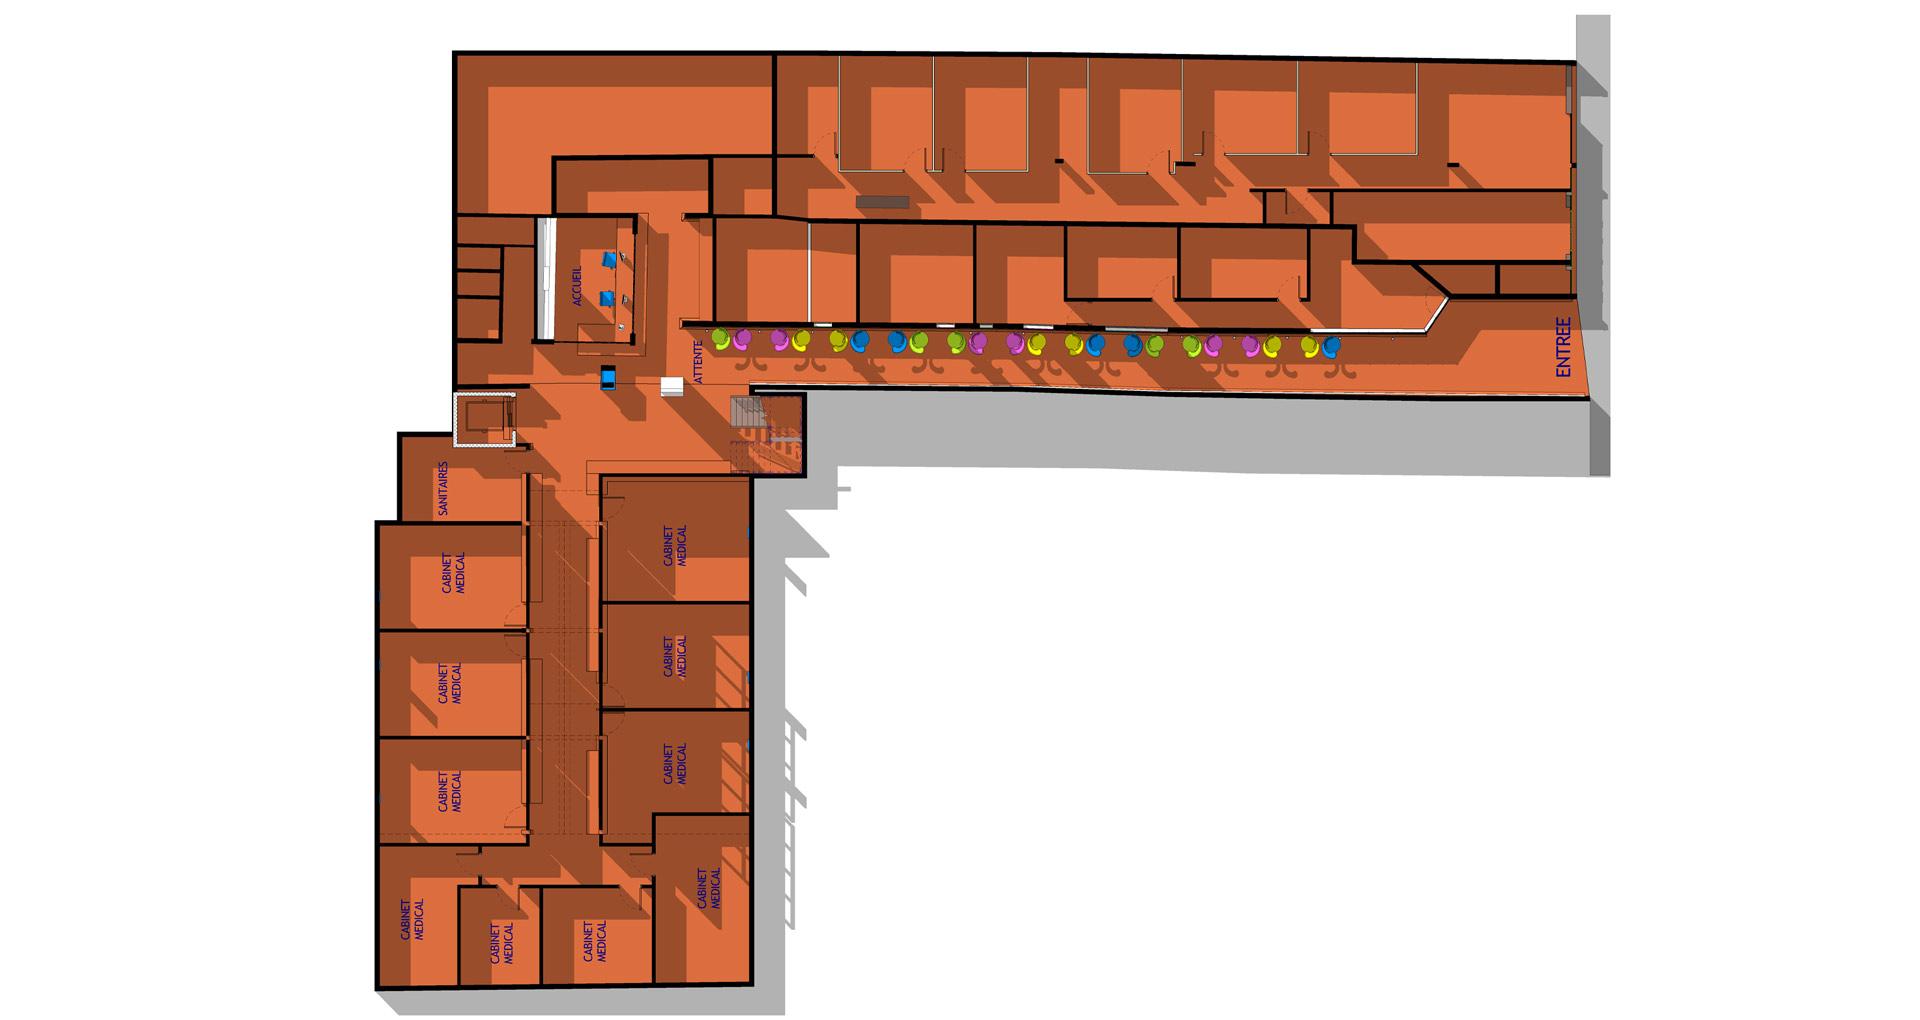 Plan RDC Maison de Santé en Guyane